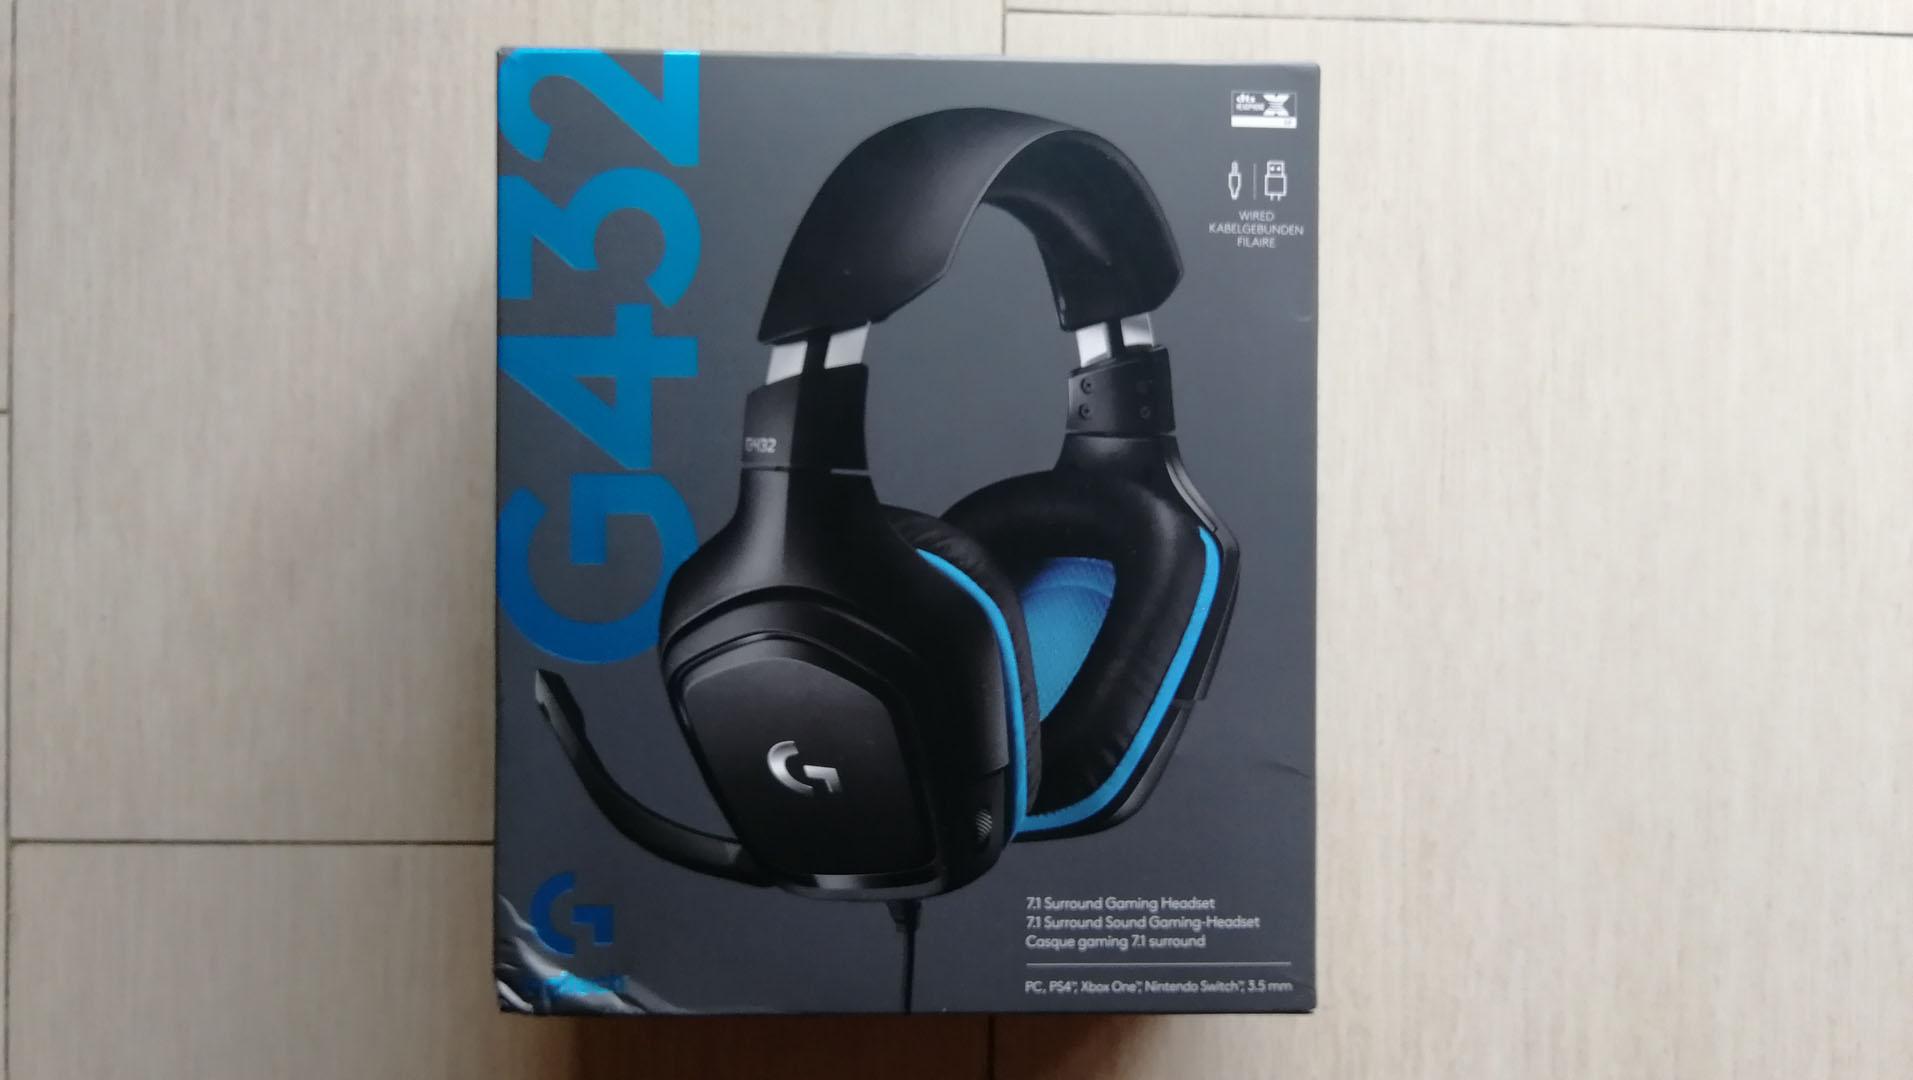 Recensione Logitech G432, headset con Dolby Surround 7.1 1